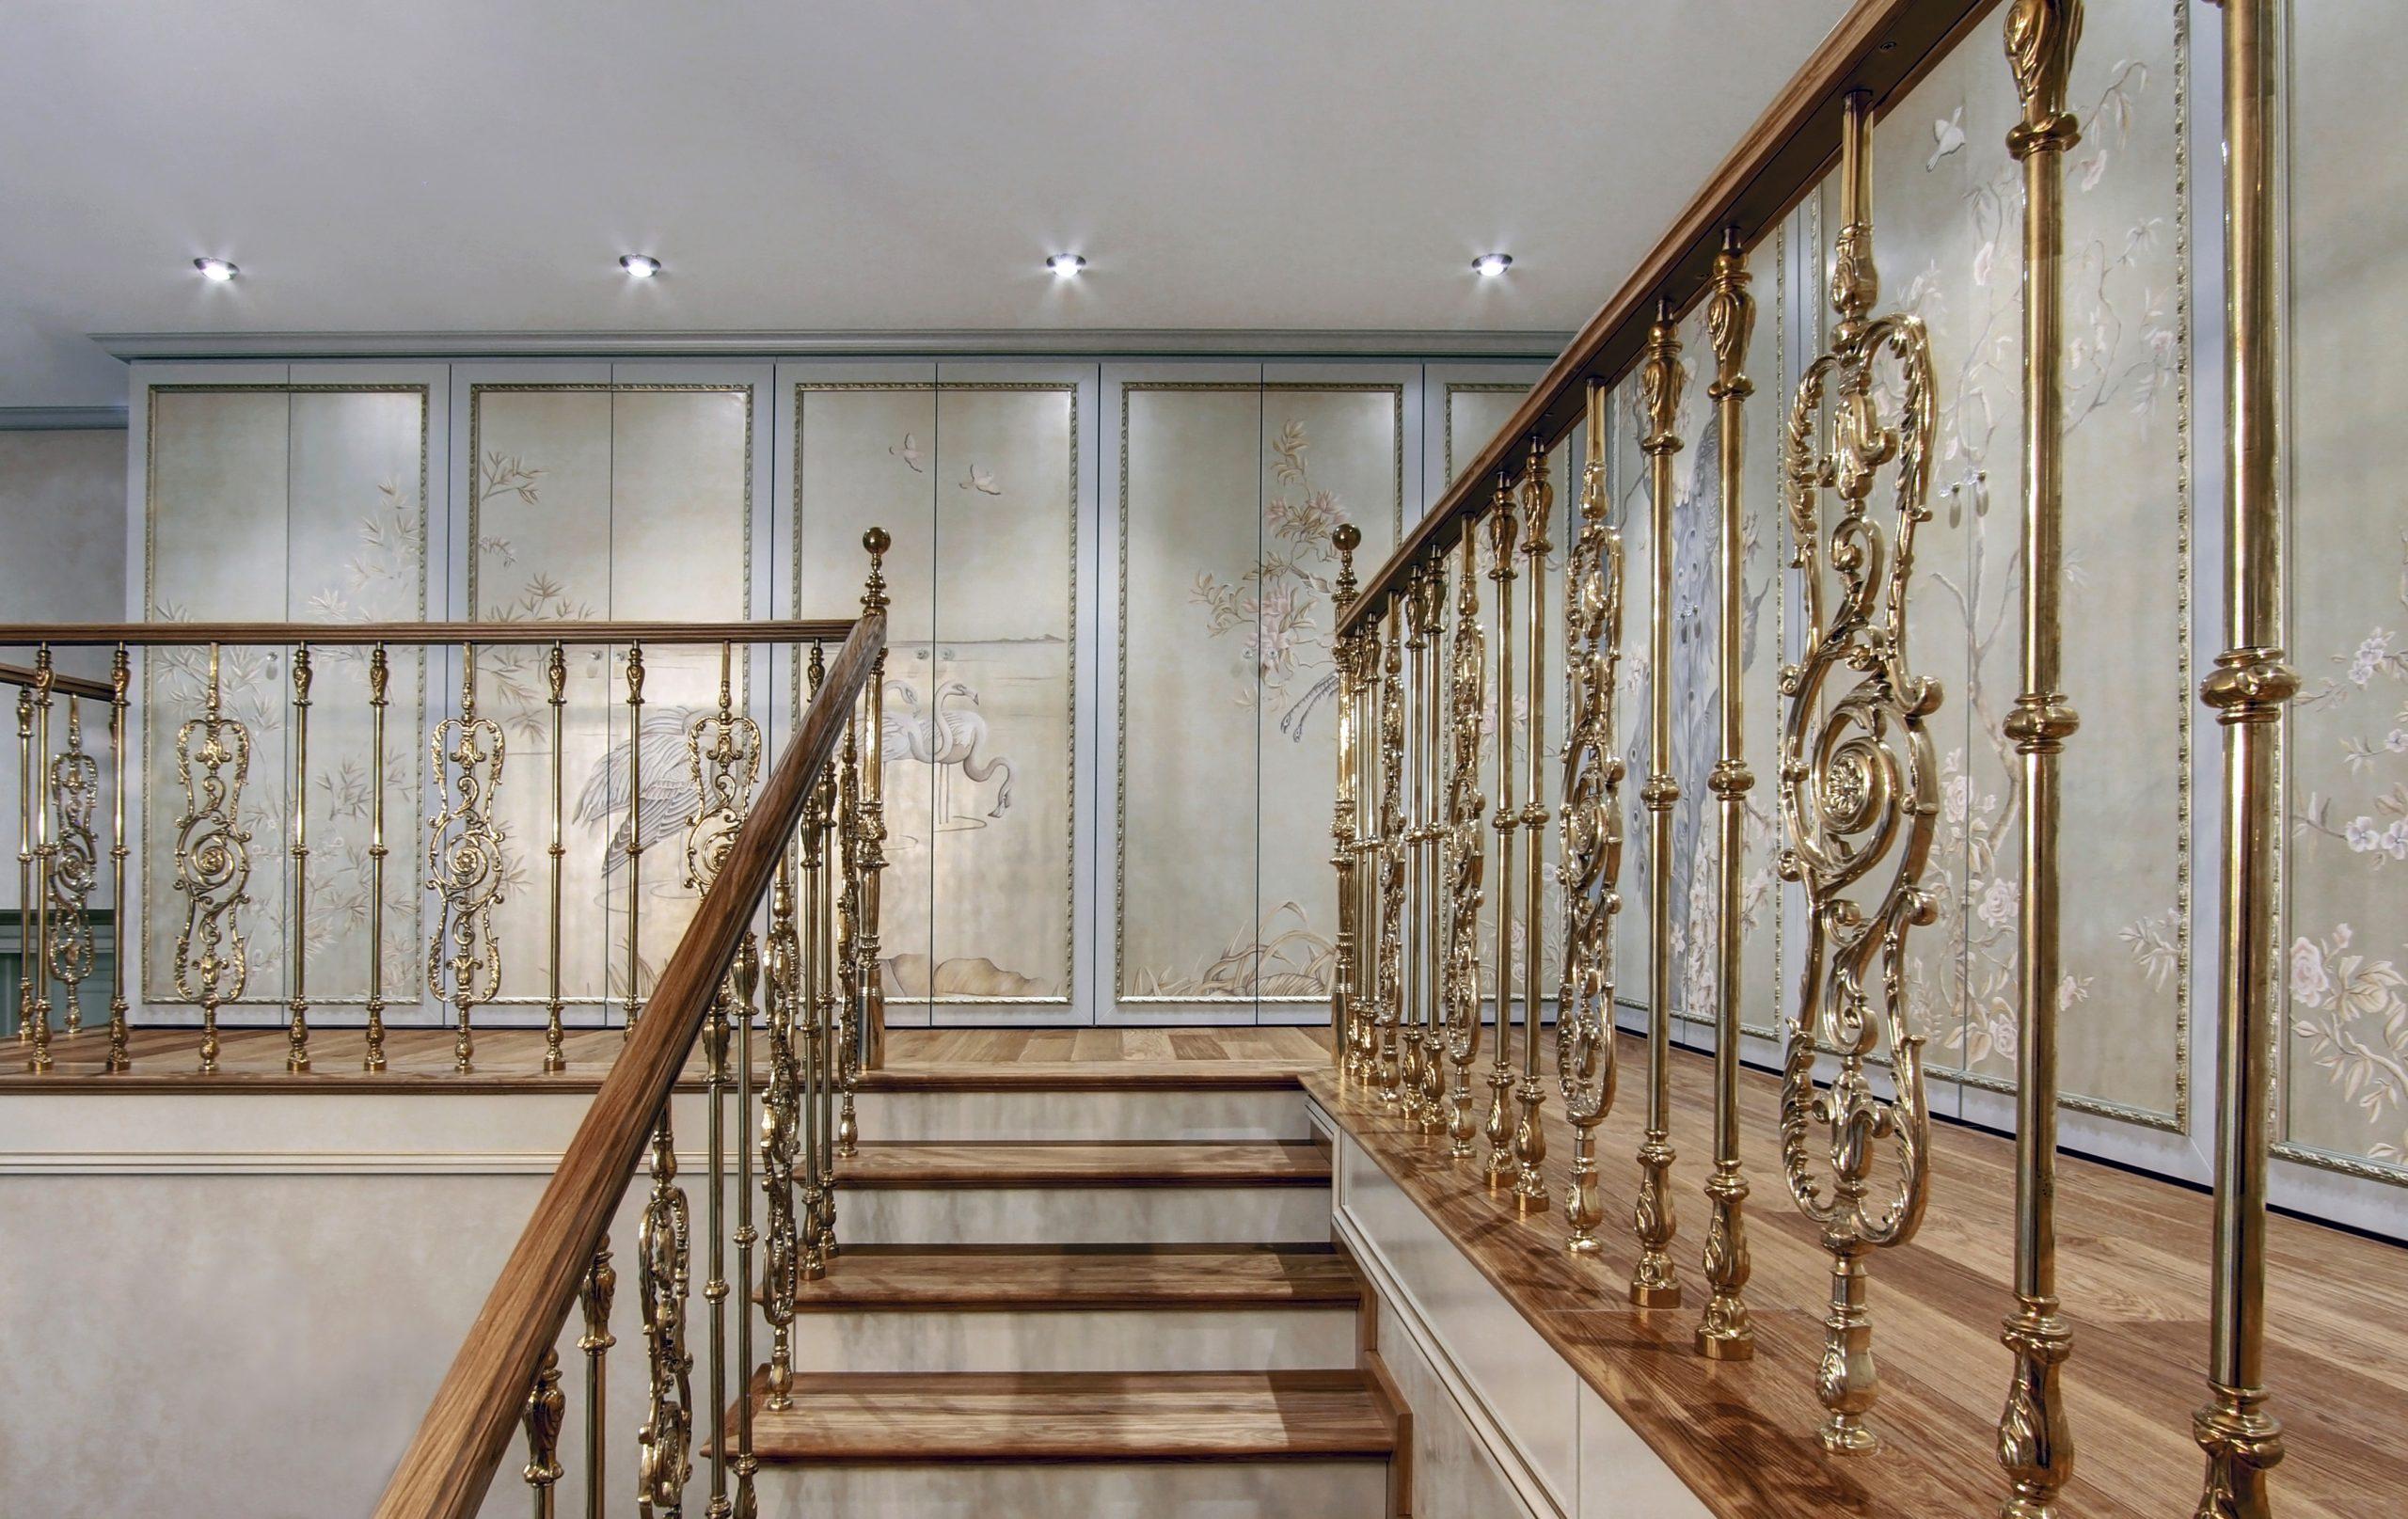 Baroque gold Staircase ornate interior design